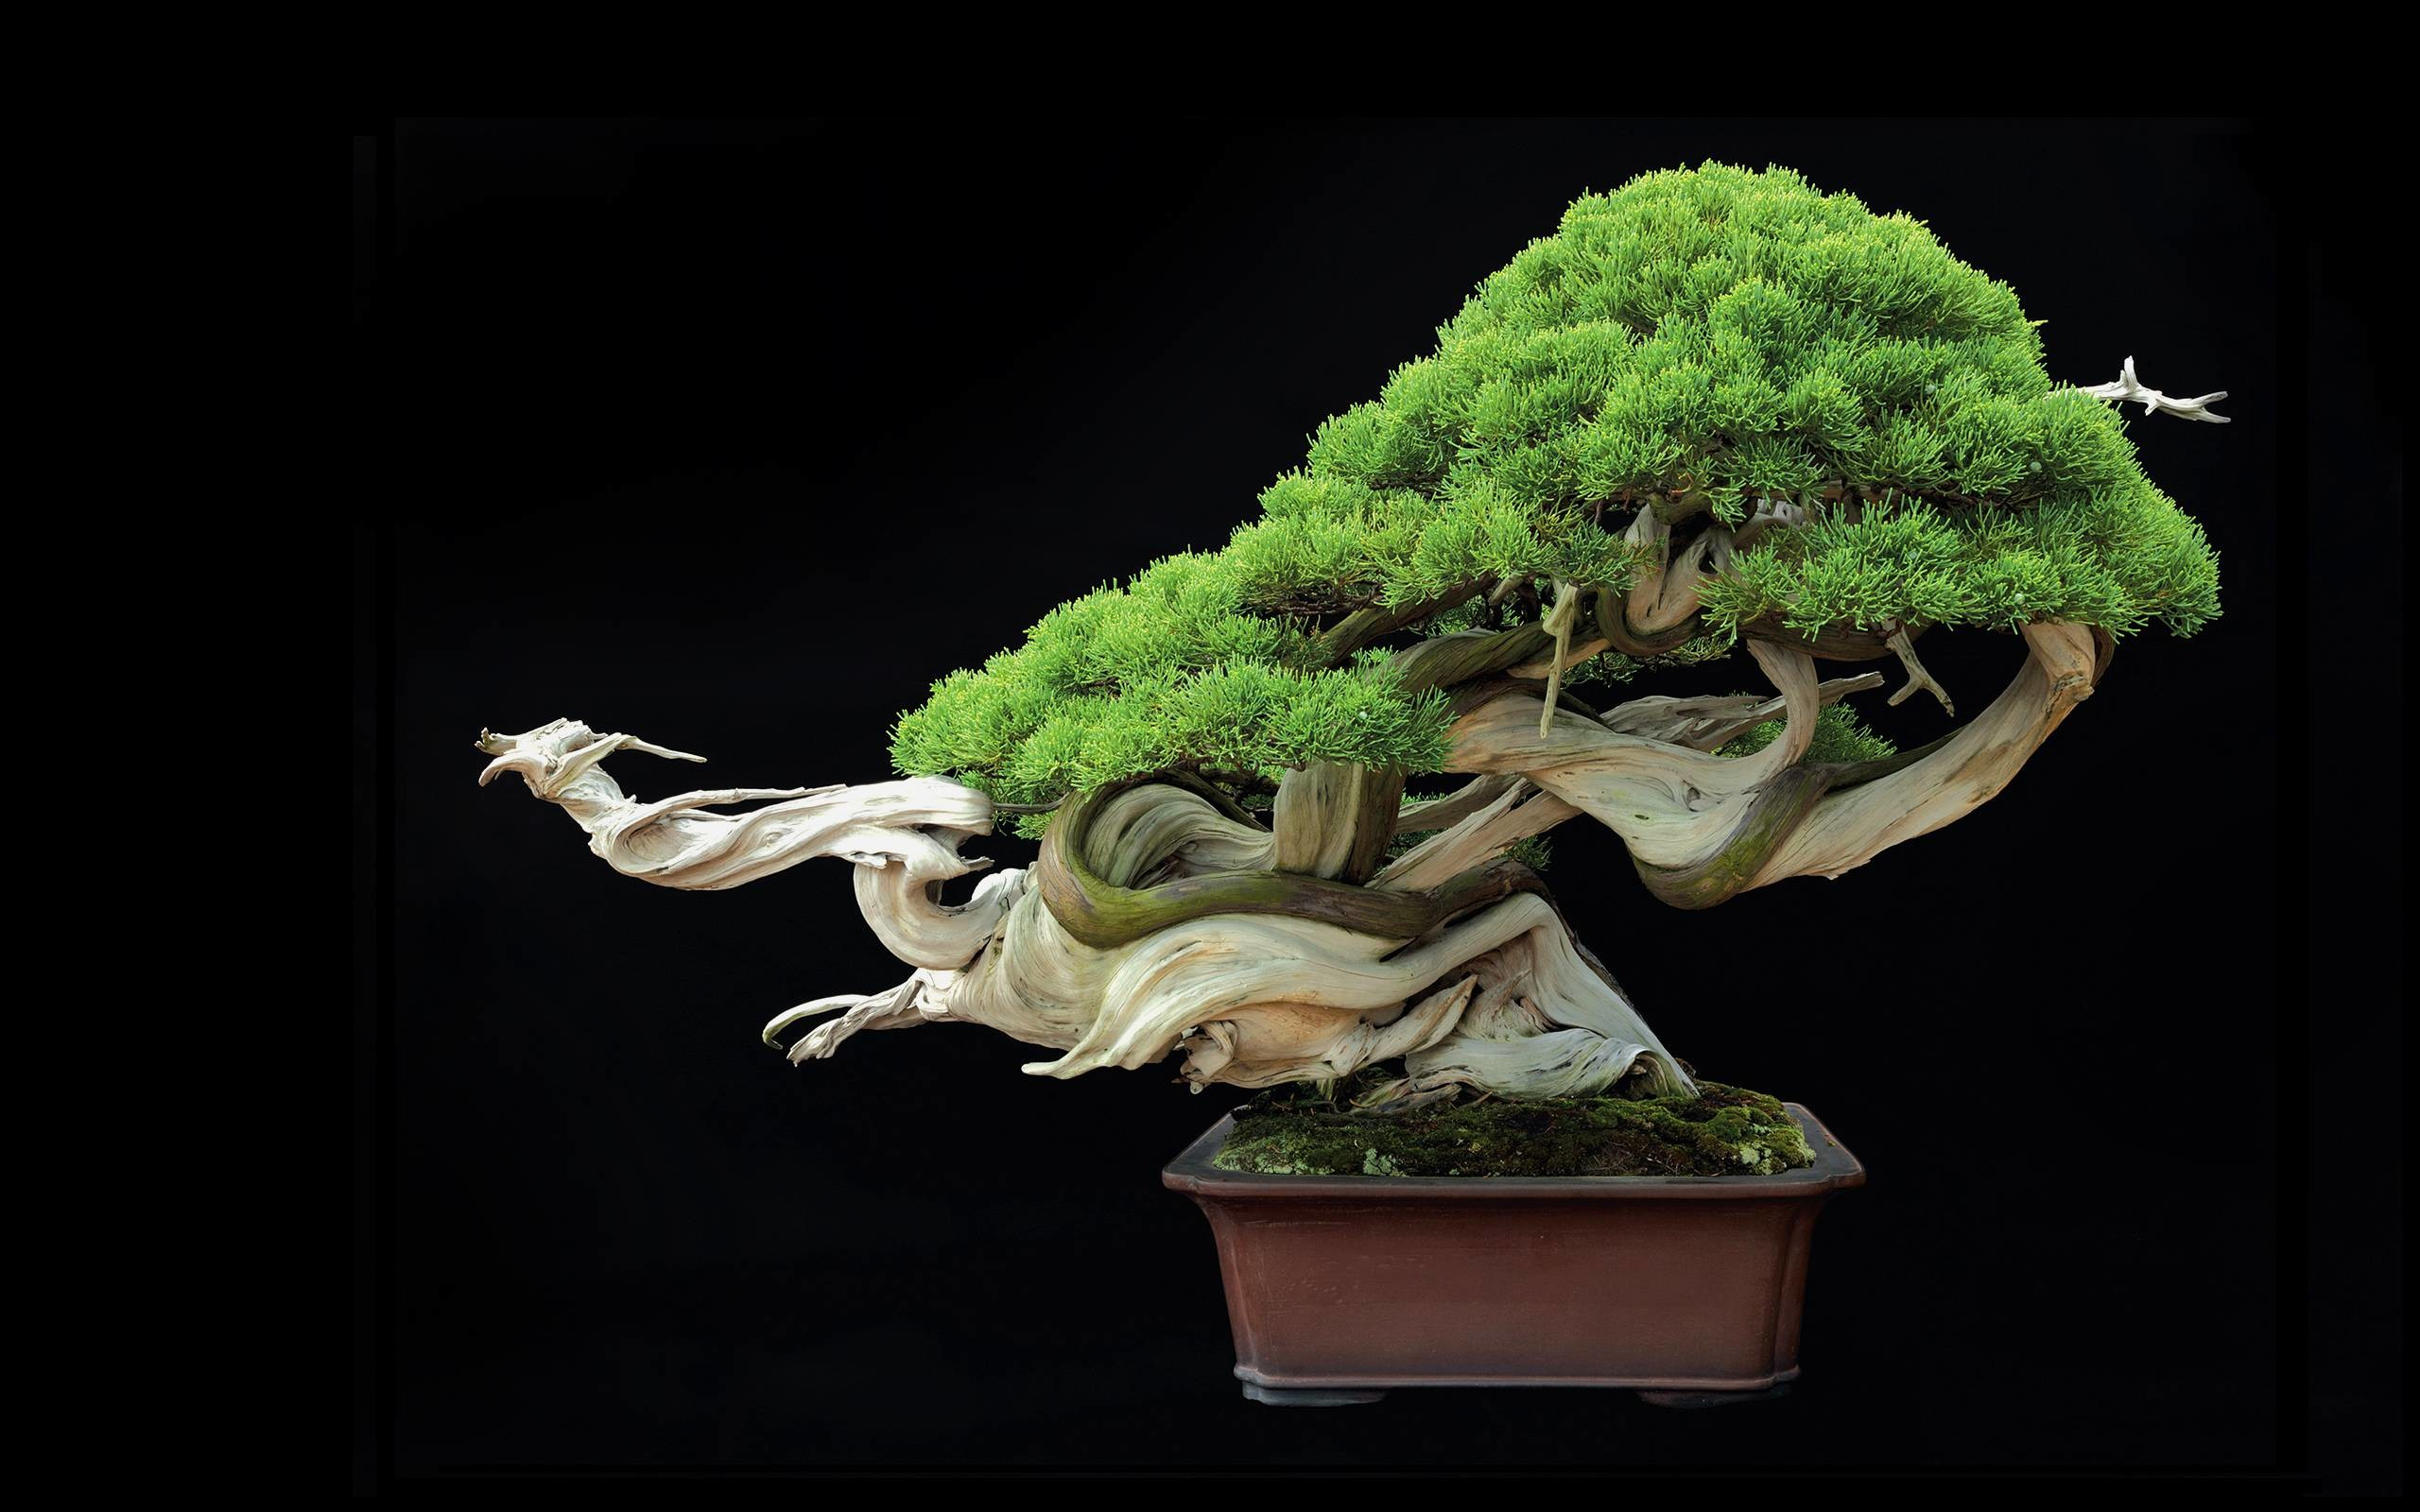 Res: 2560x1600, Tree Bonsai Tree leaves g wallpaper |  | 67870 | WallpaperUP